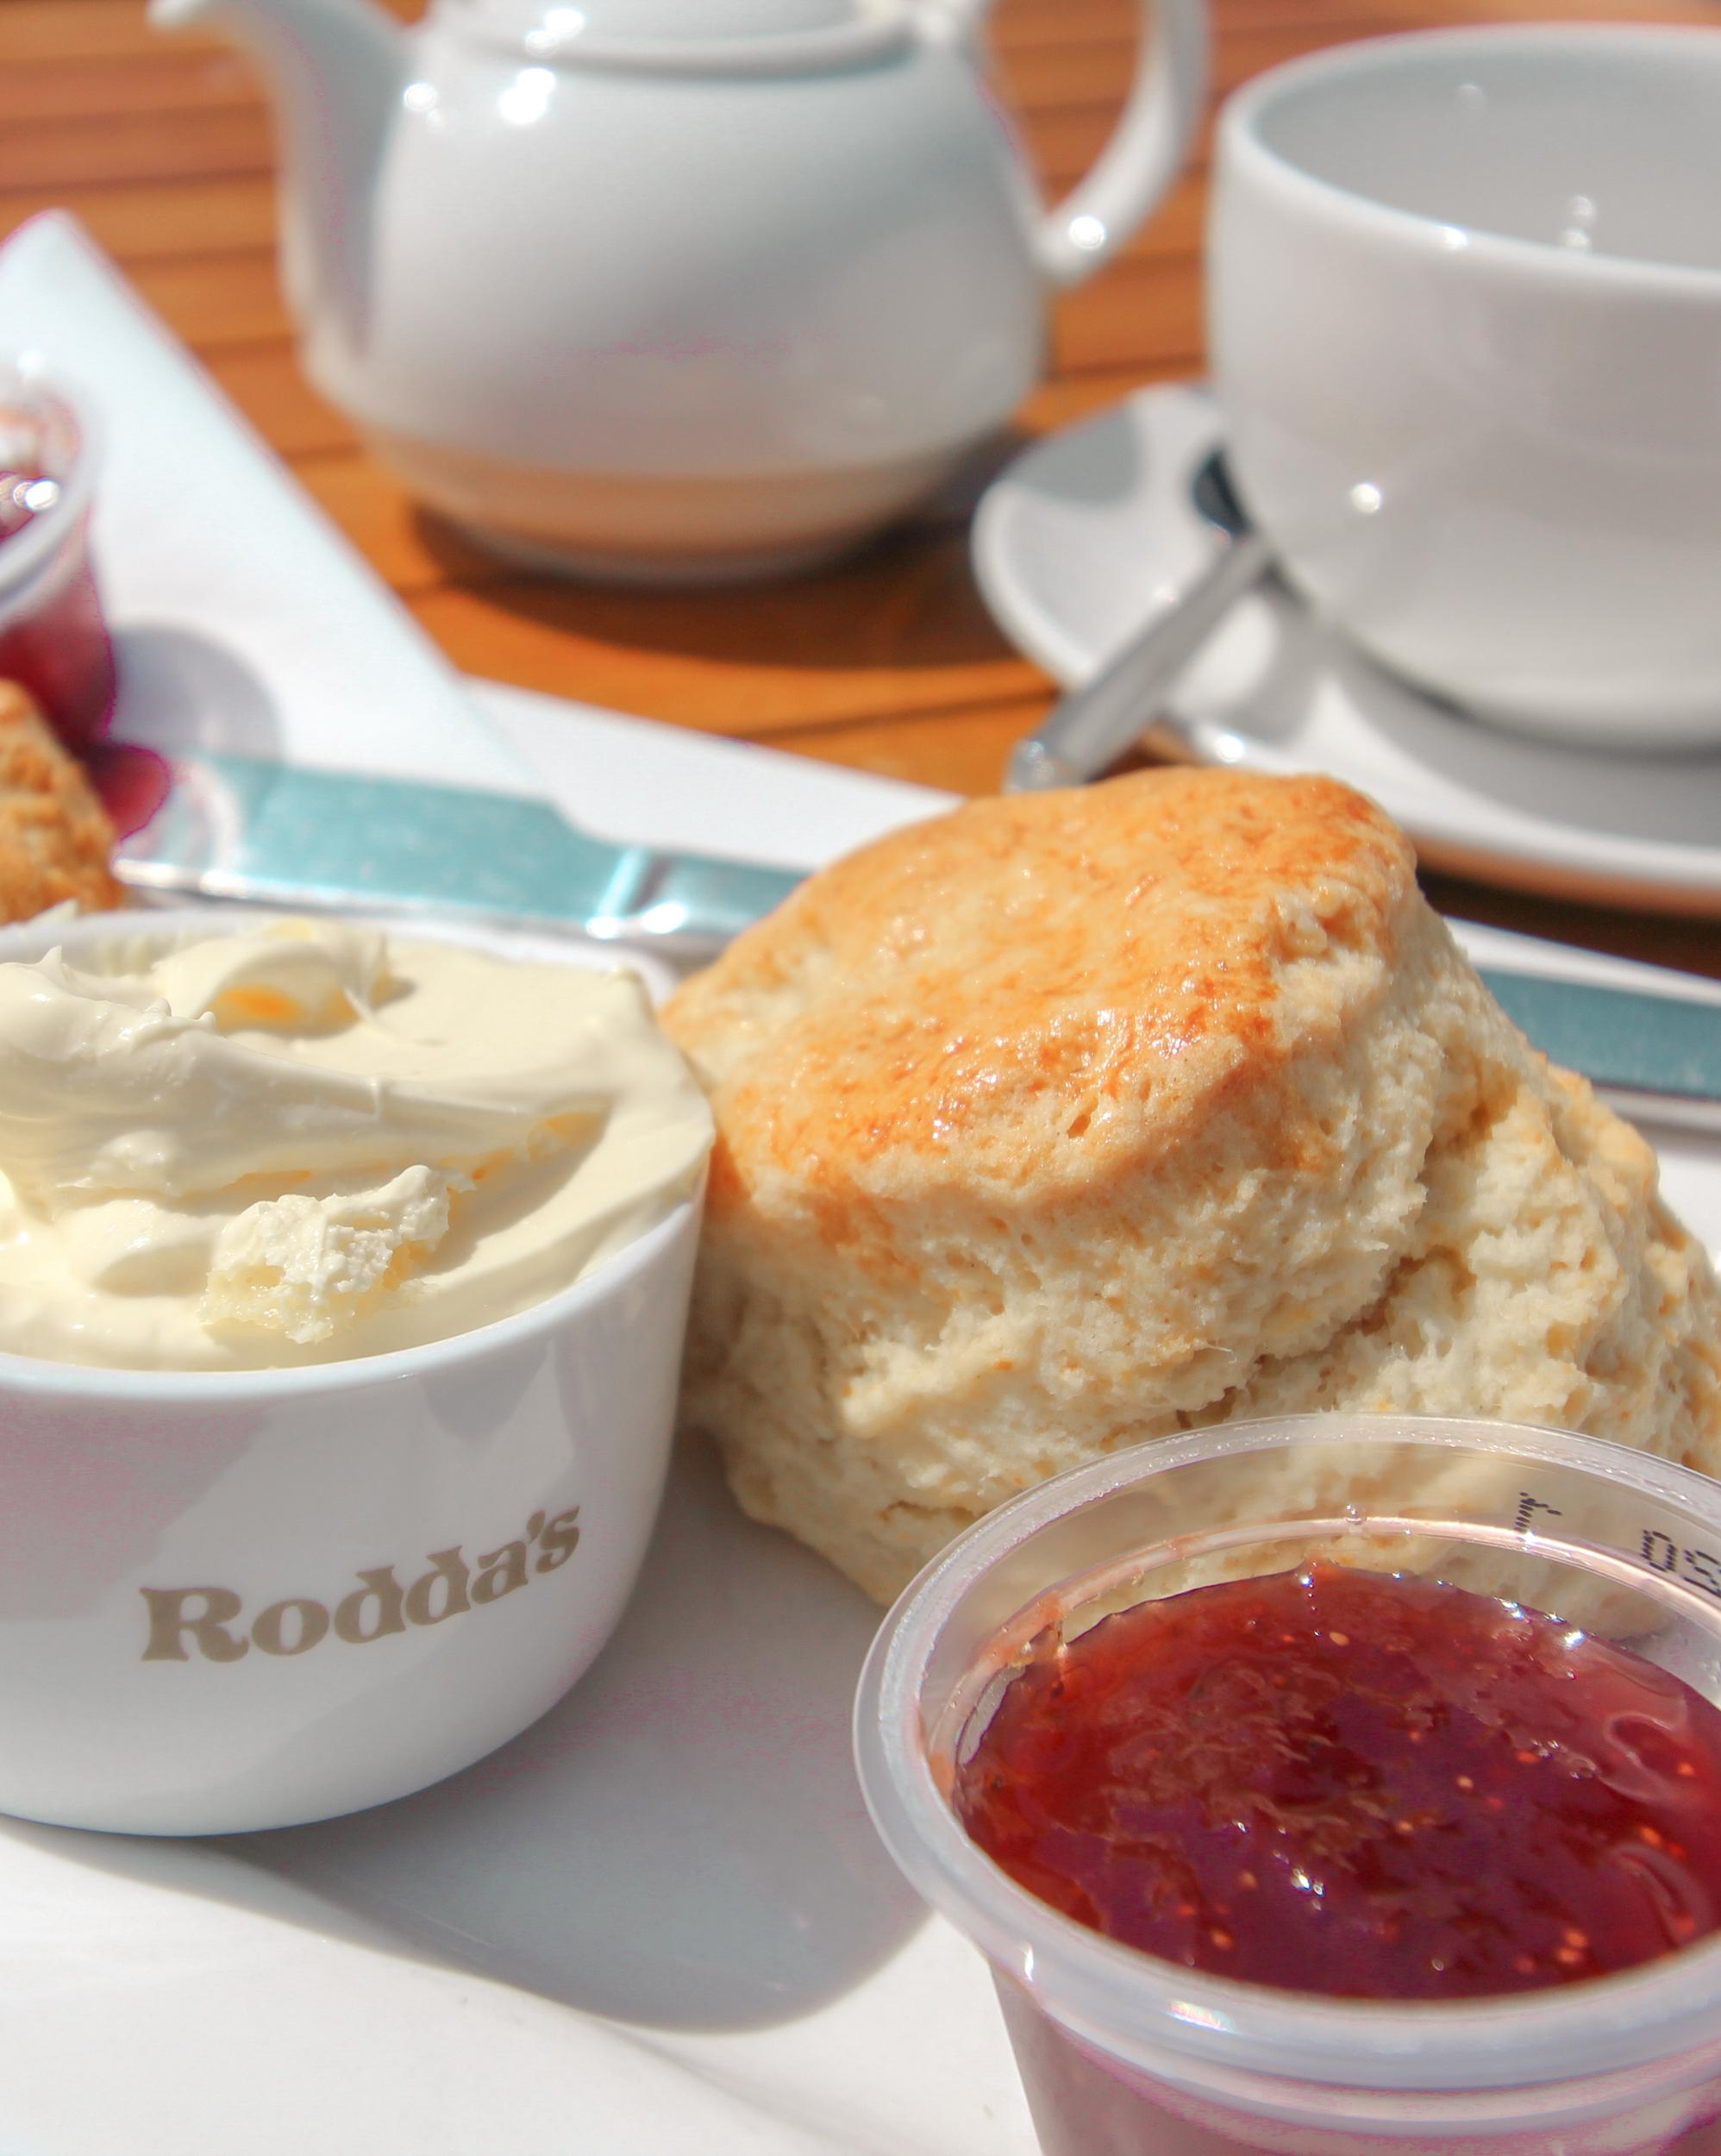 Cornish Cream Tea - Clotted cream and jam on a scone!